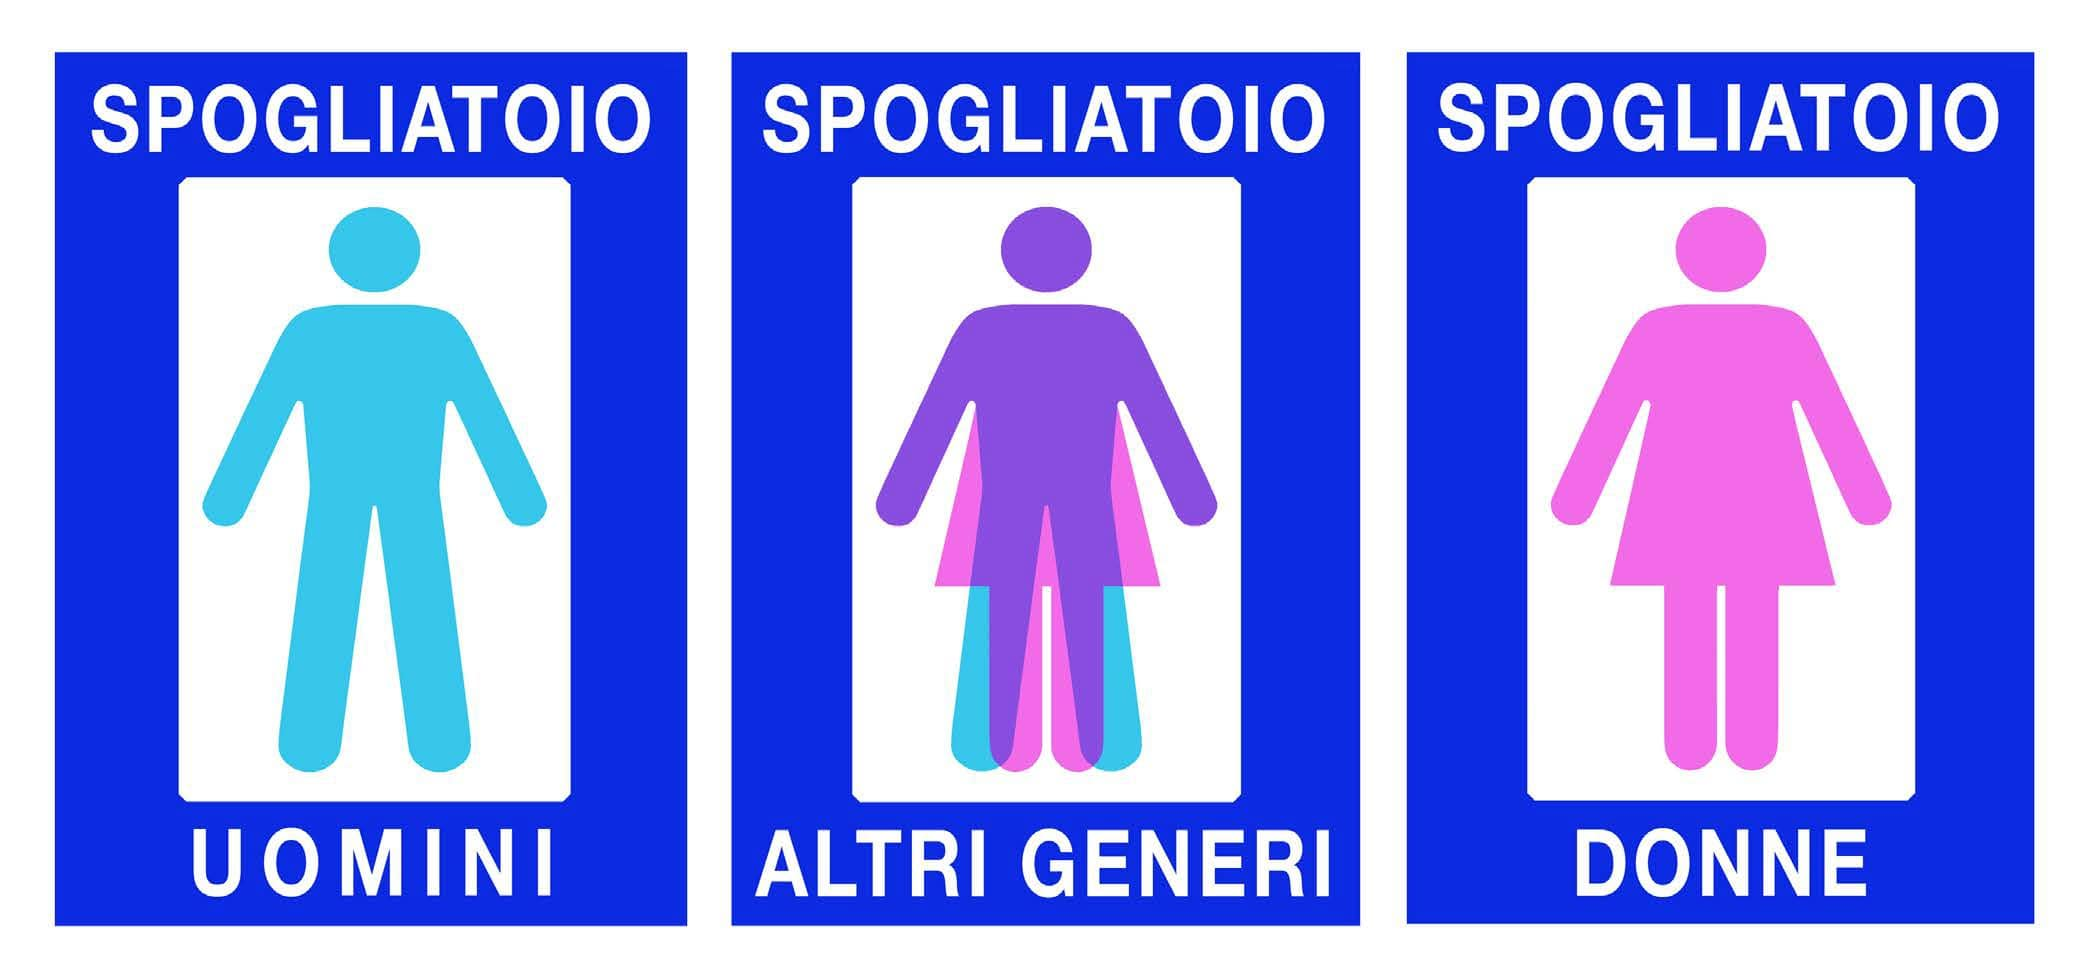 Francesco Garbelli, Spogliatoio altri generi 2017 2